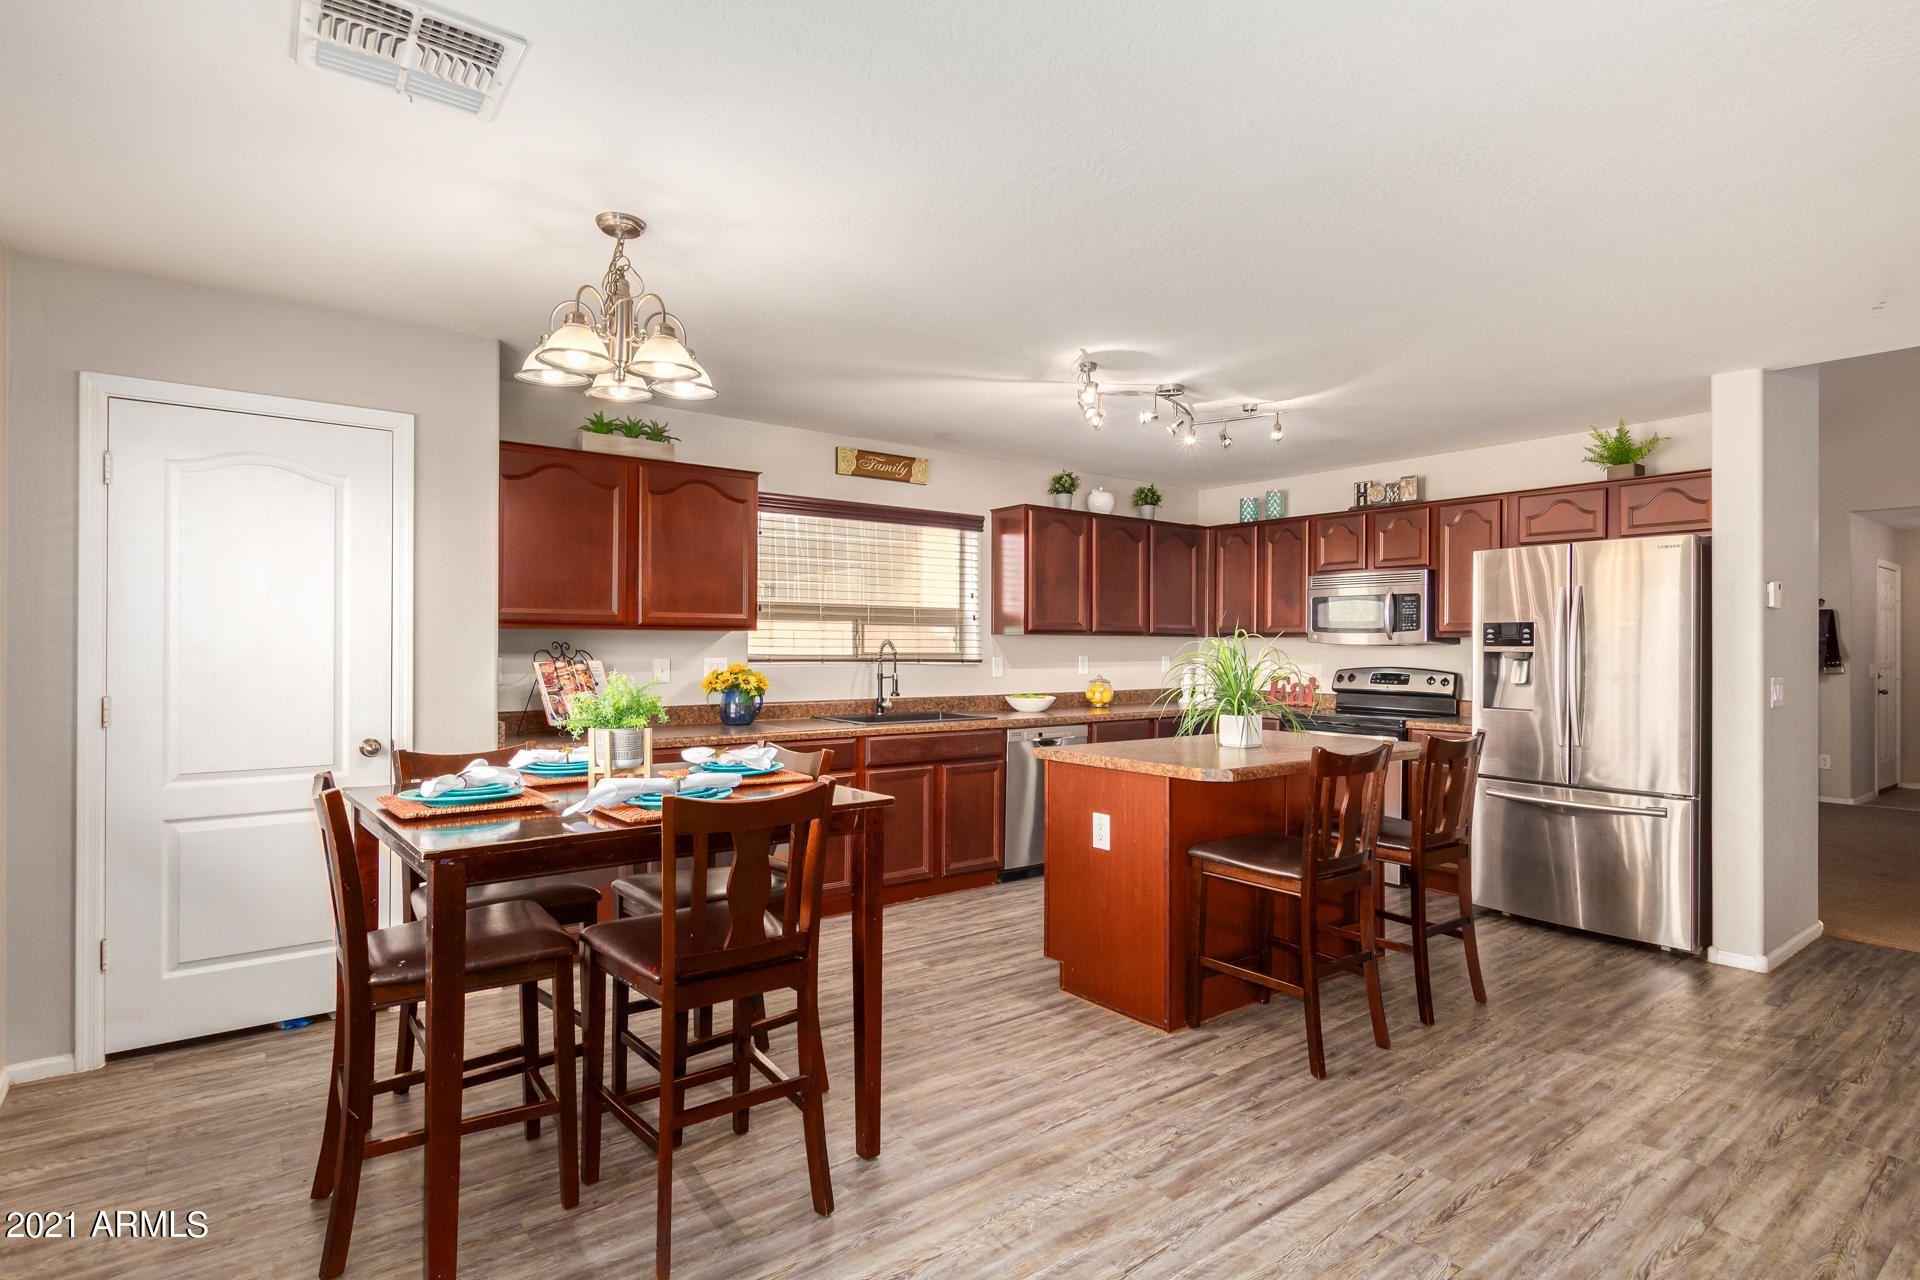 Photo of 1480 E LESLIE Avenue, San Tan Valley, AZ 85140 (MLS # 6268891)